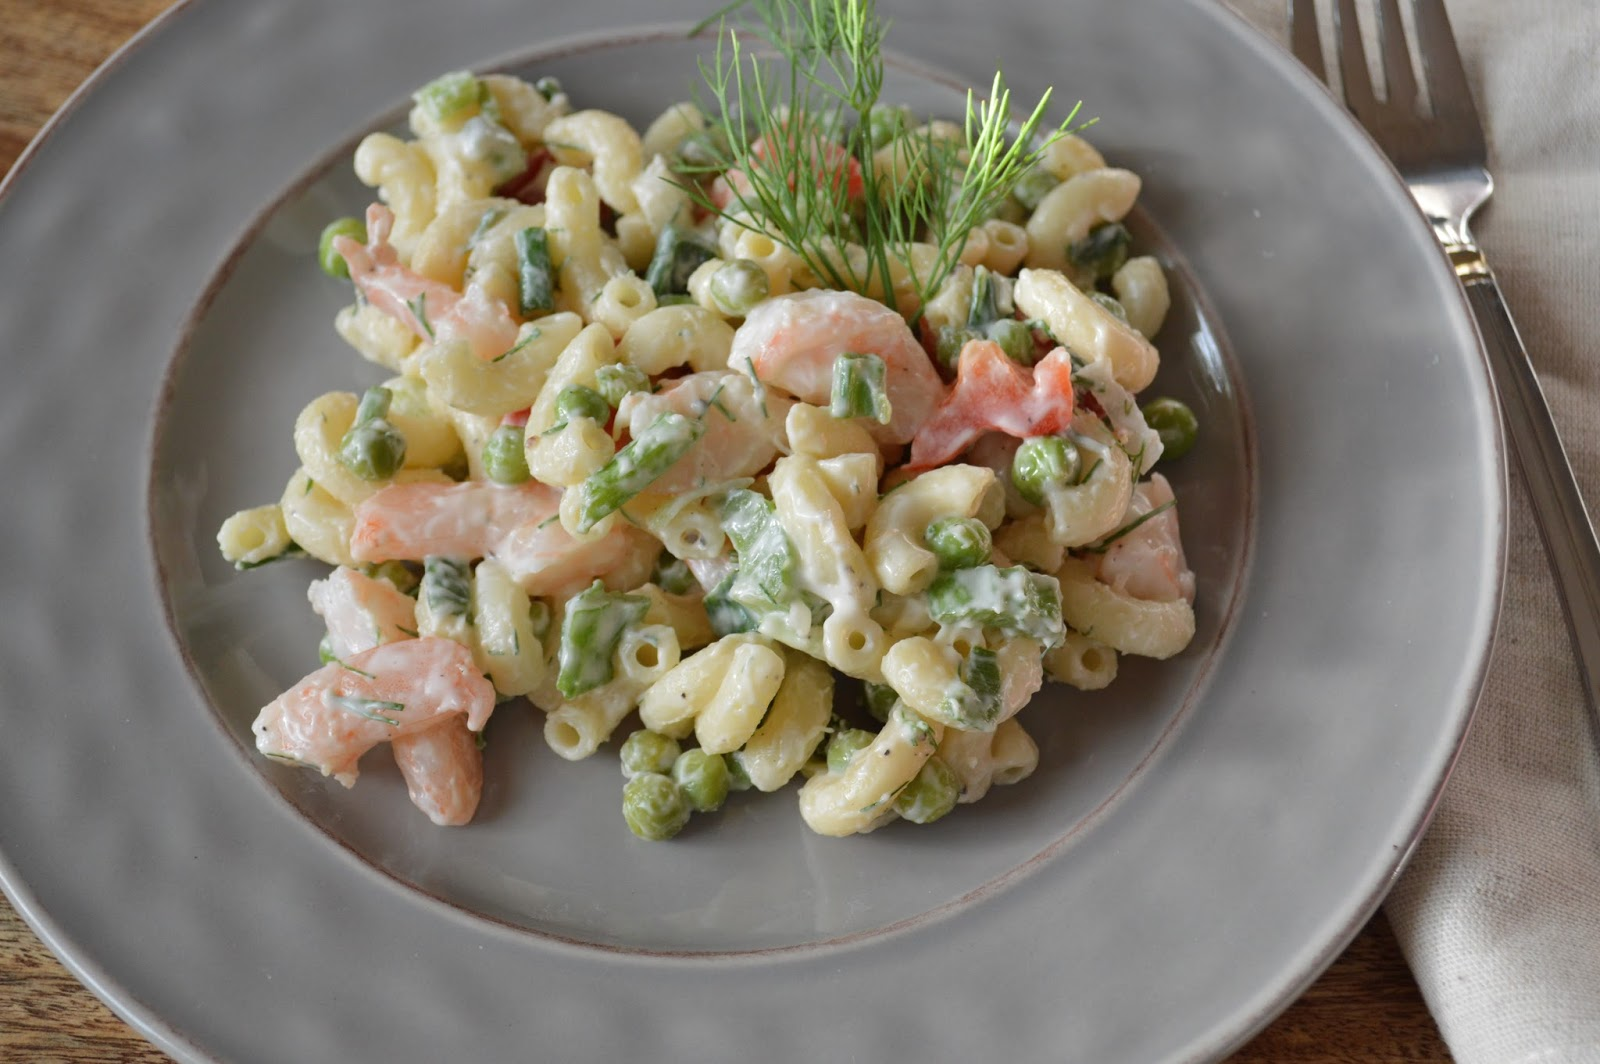 The Messy Apron: Shrimp Pasta Salad